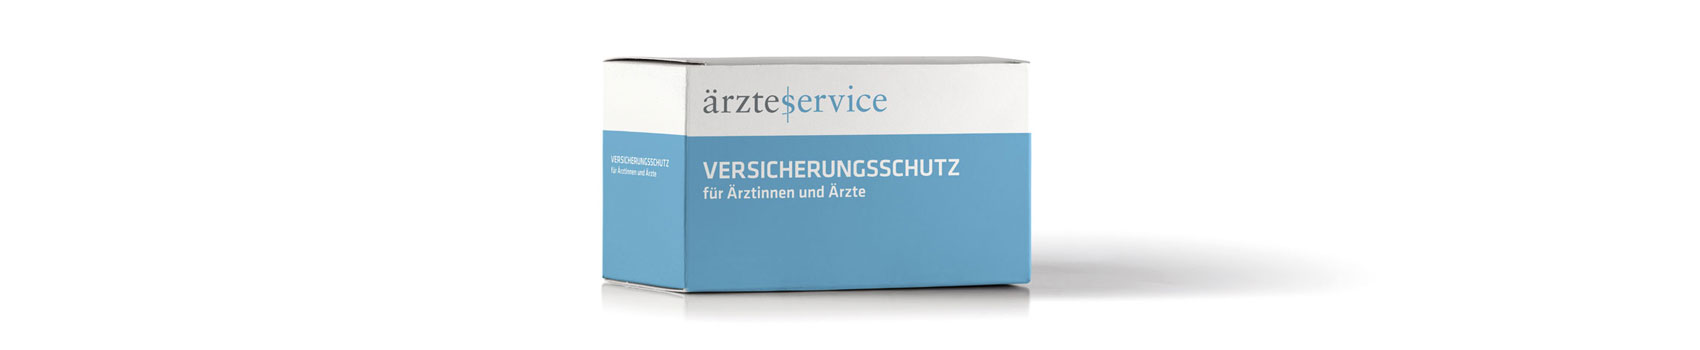 slider-arzteService